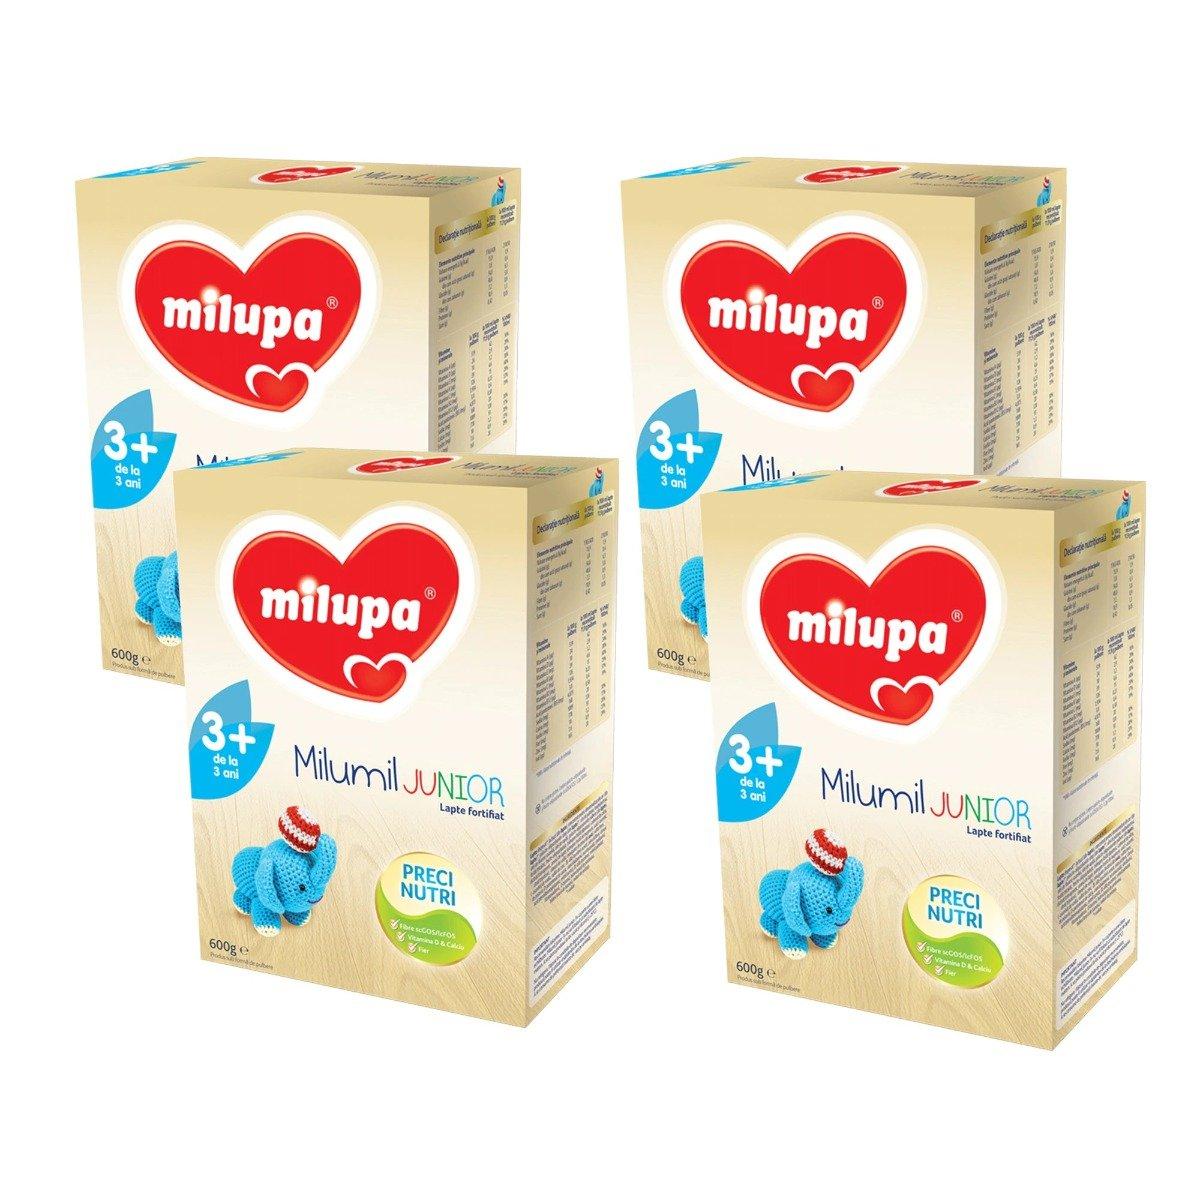 Lapte praf Milupa Milumil Junior 3+, 4 pachete x 600 g imagine